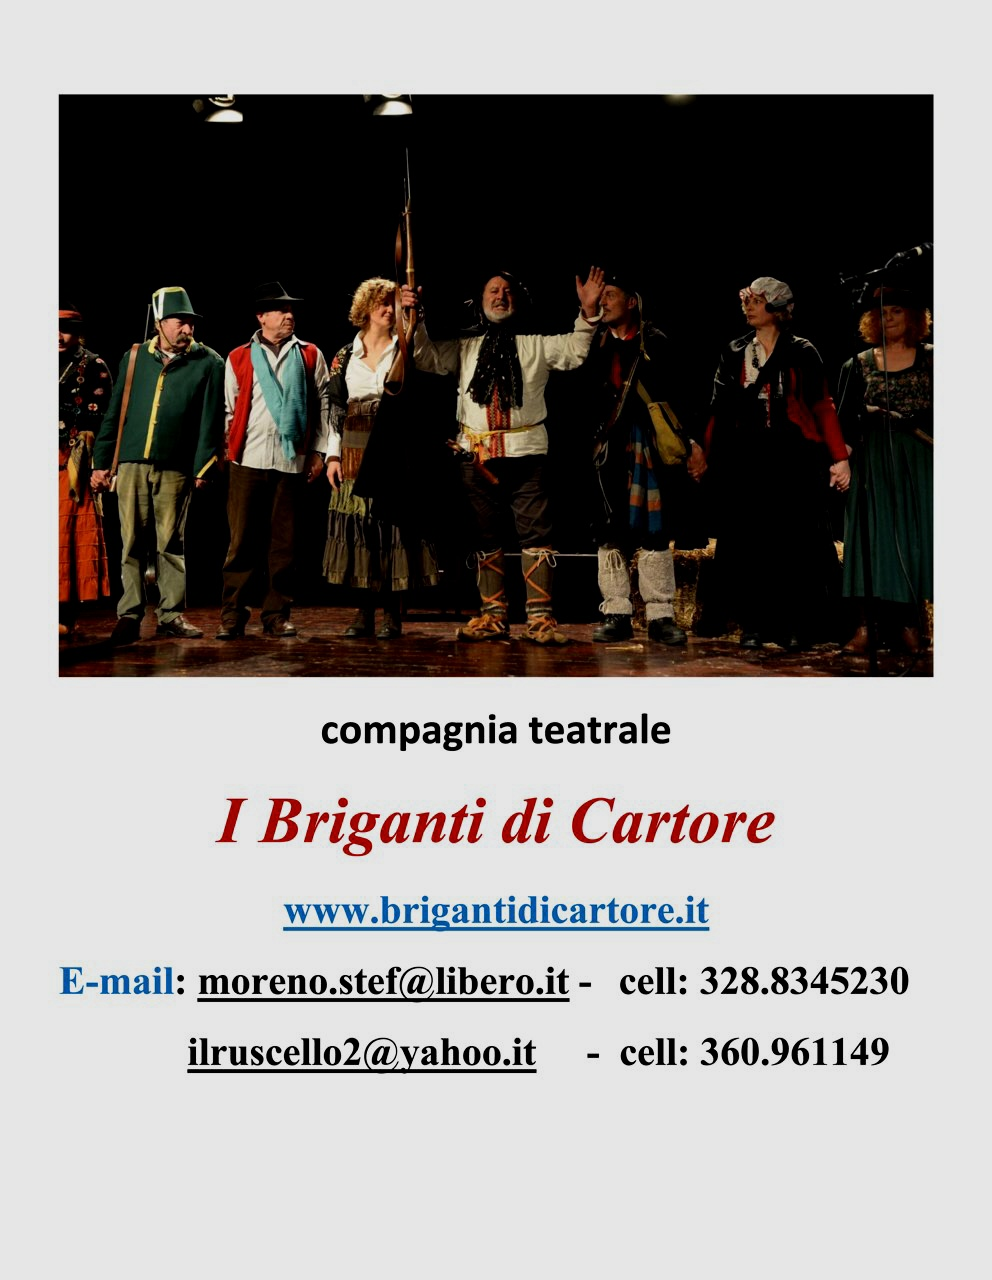 Ranucci teatro Fellini Pontinia 2#001